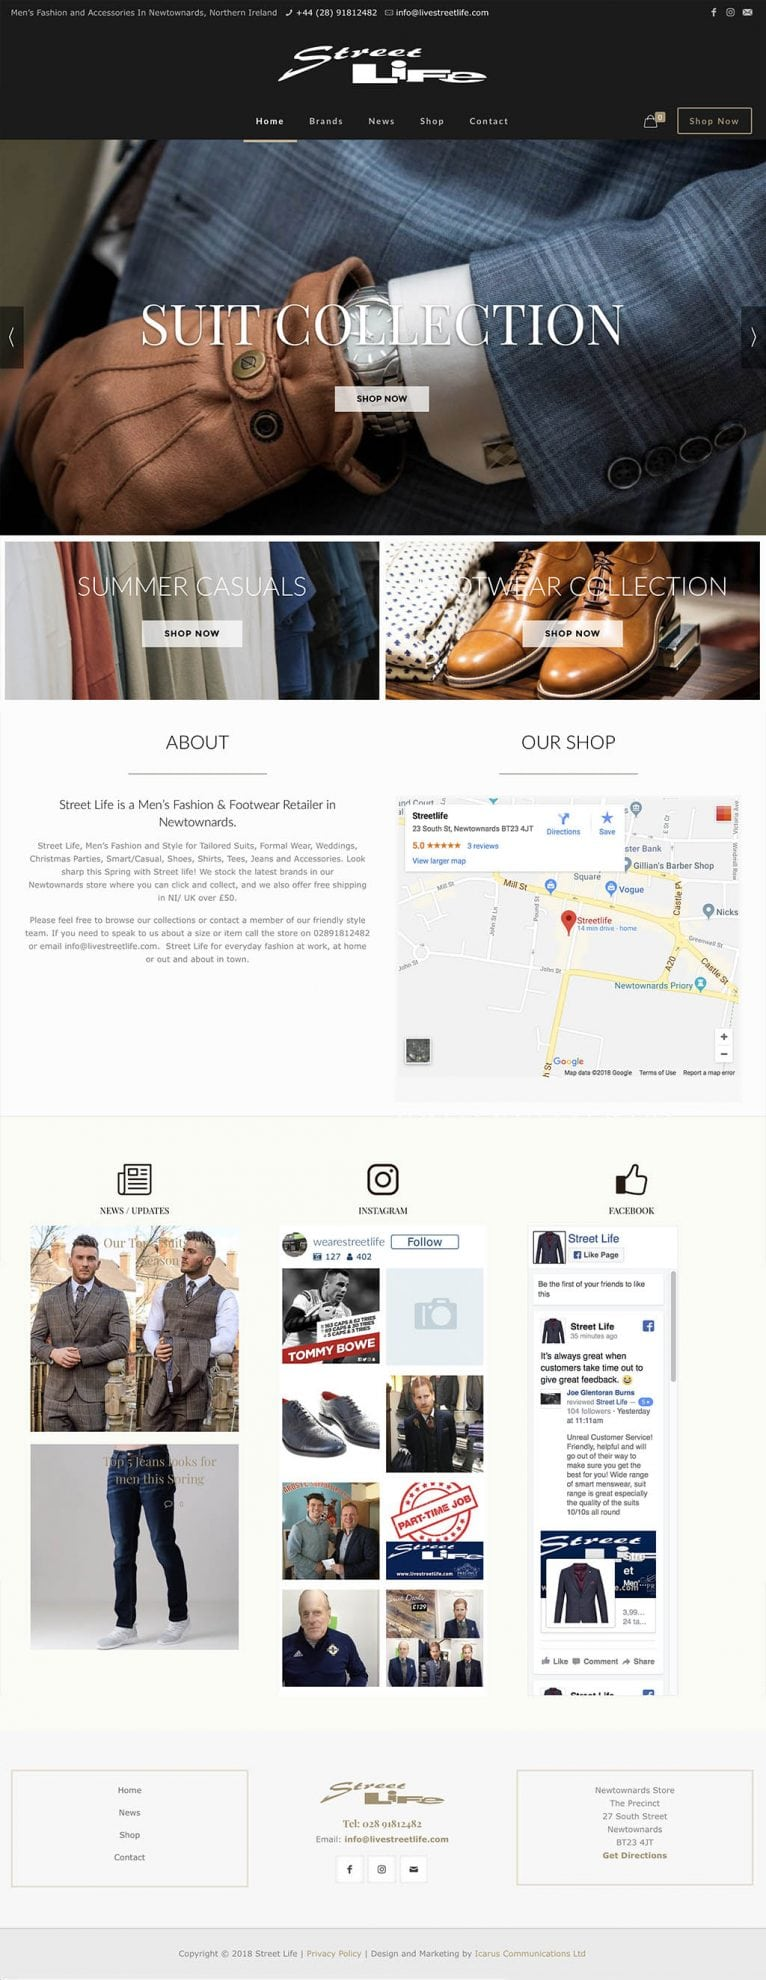 Street Life Homepage